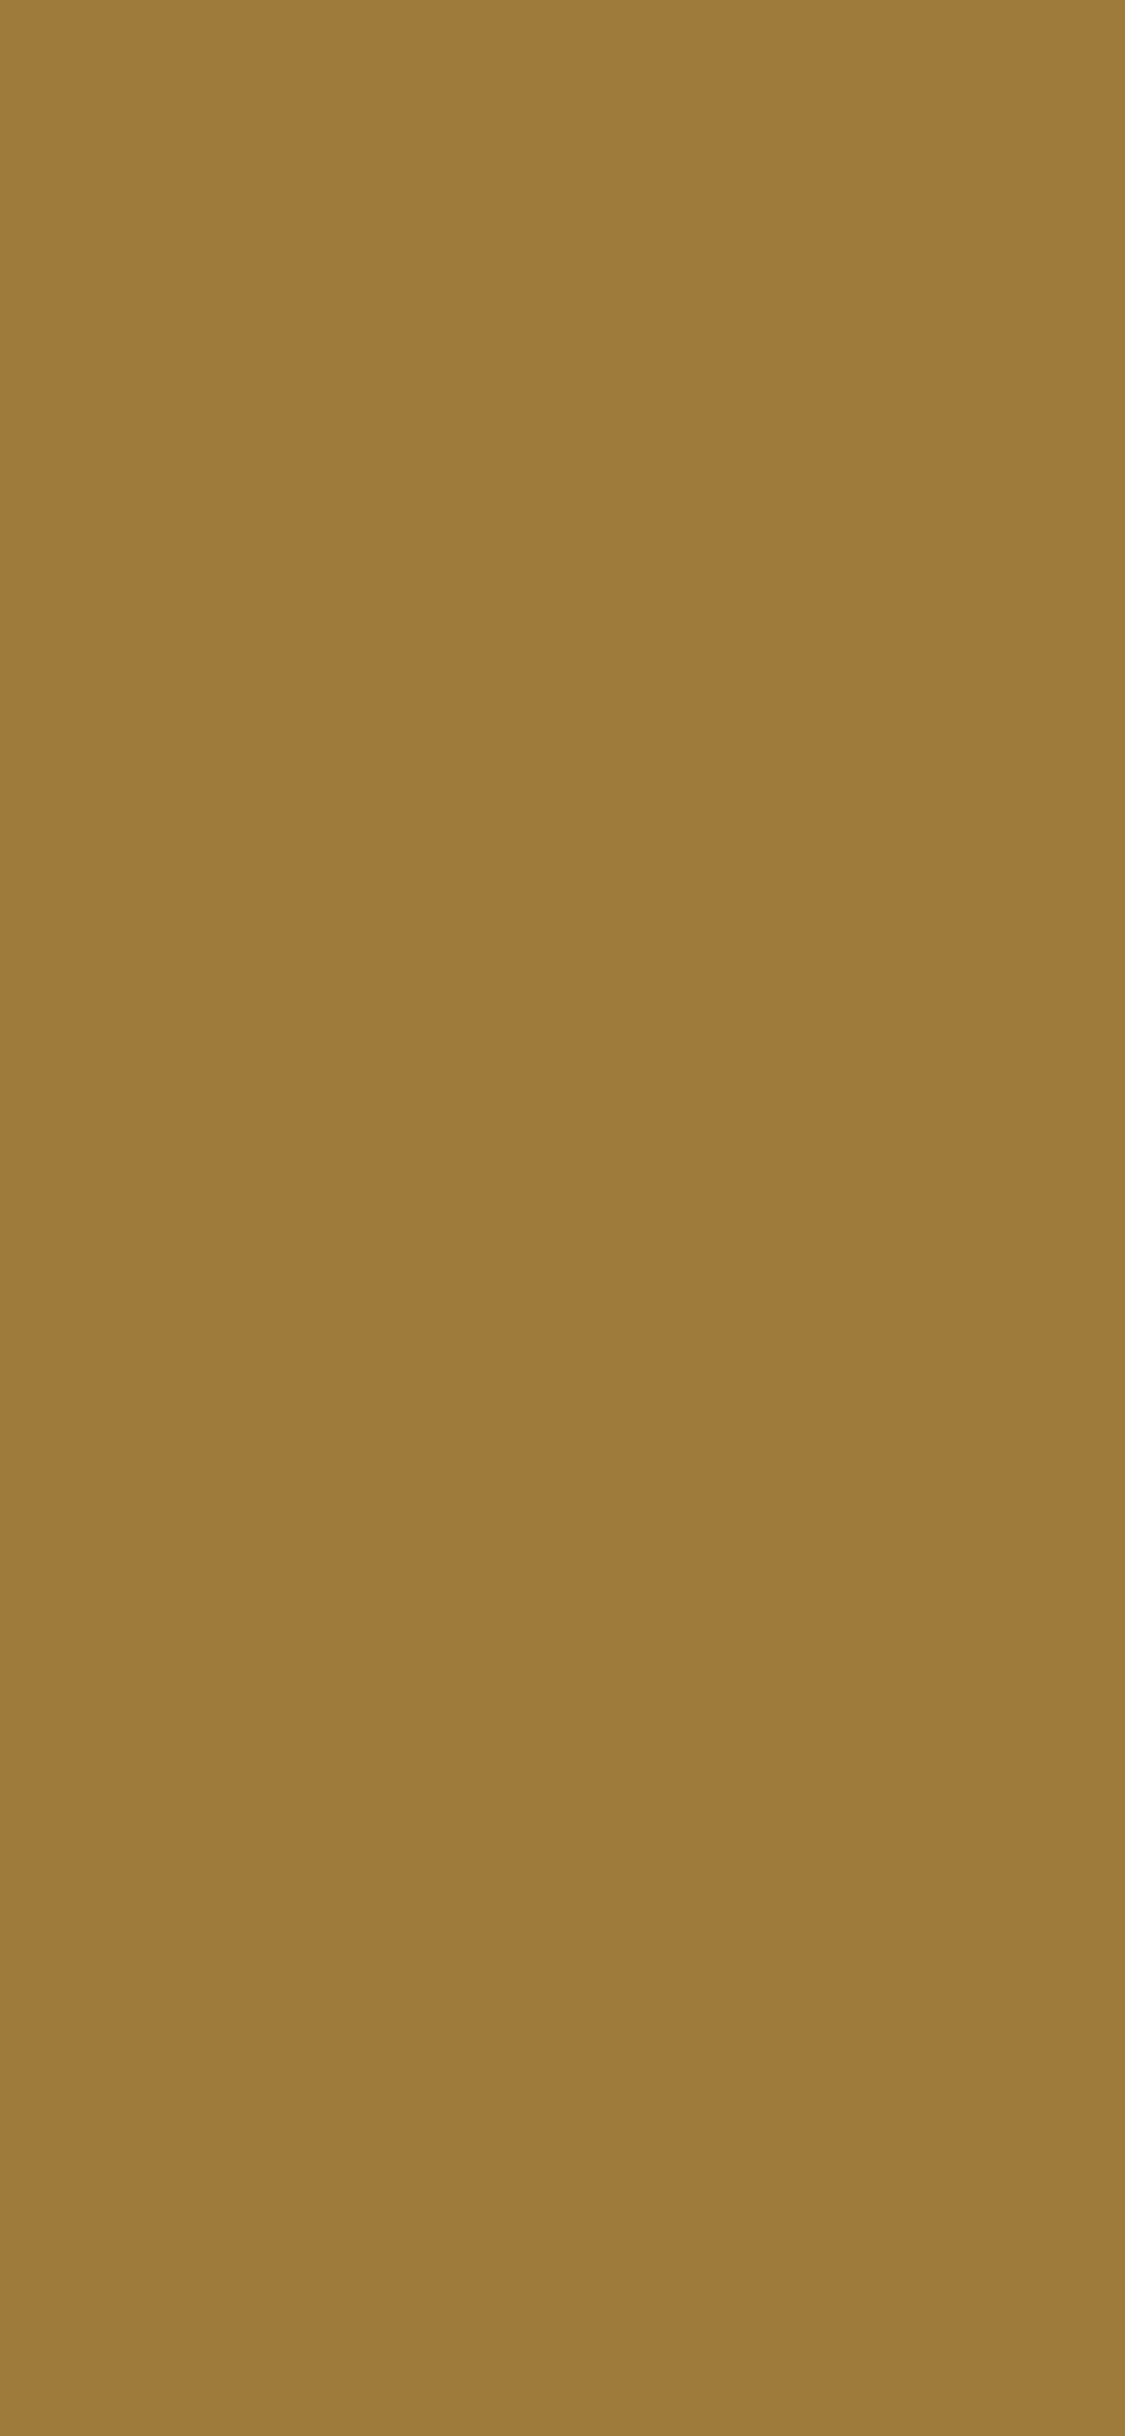 1125x2436 Metallic Sunburst Solid Color Background